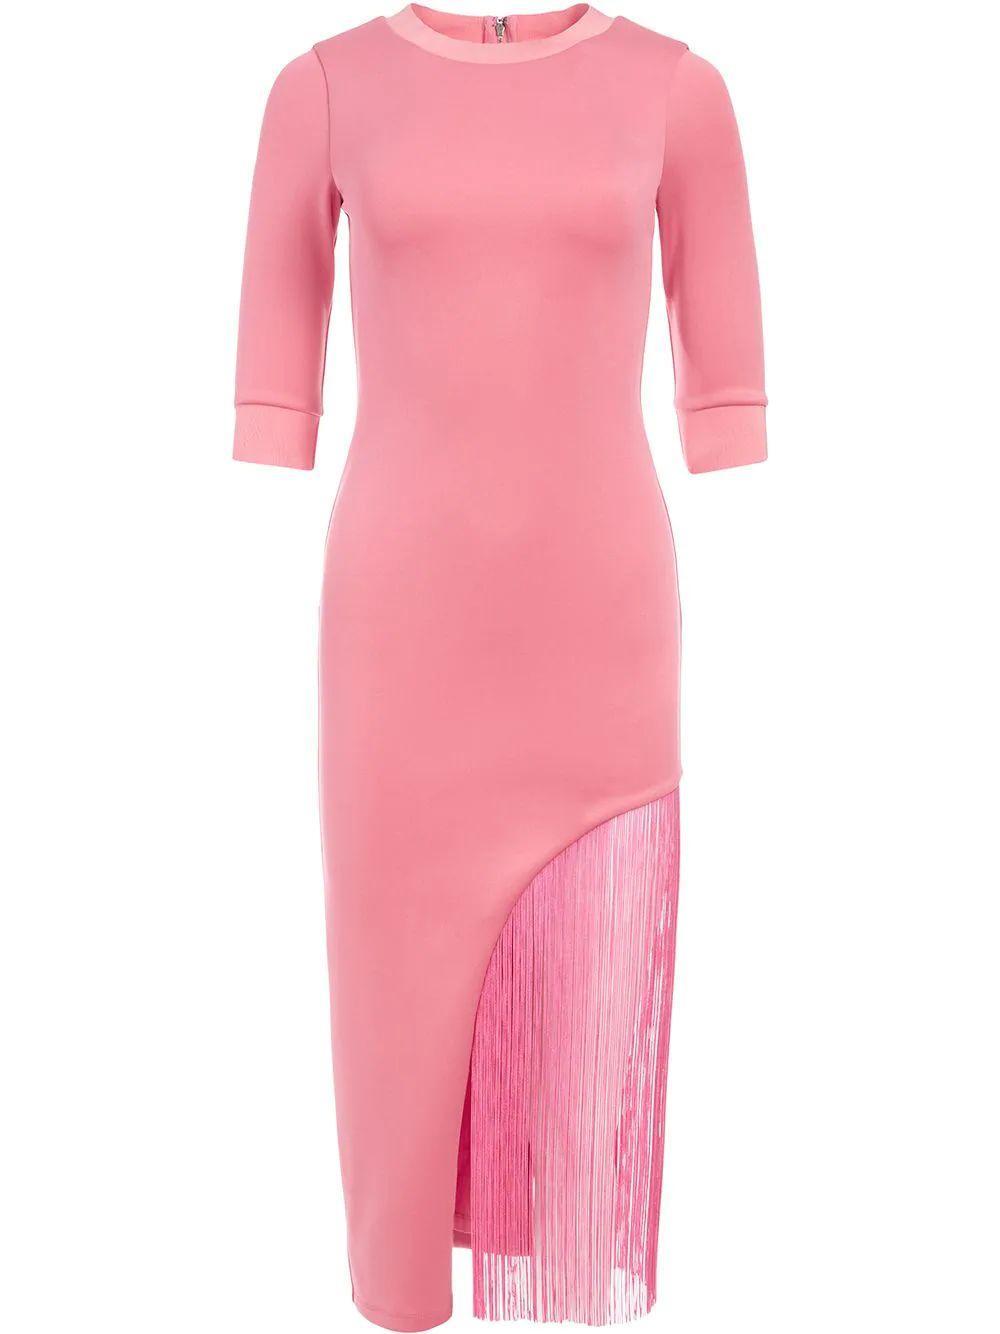 Keanna Fringe Dress Item # CC102W25526